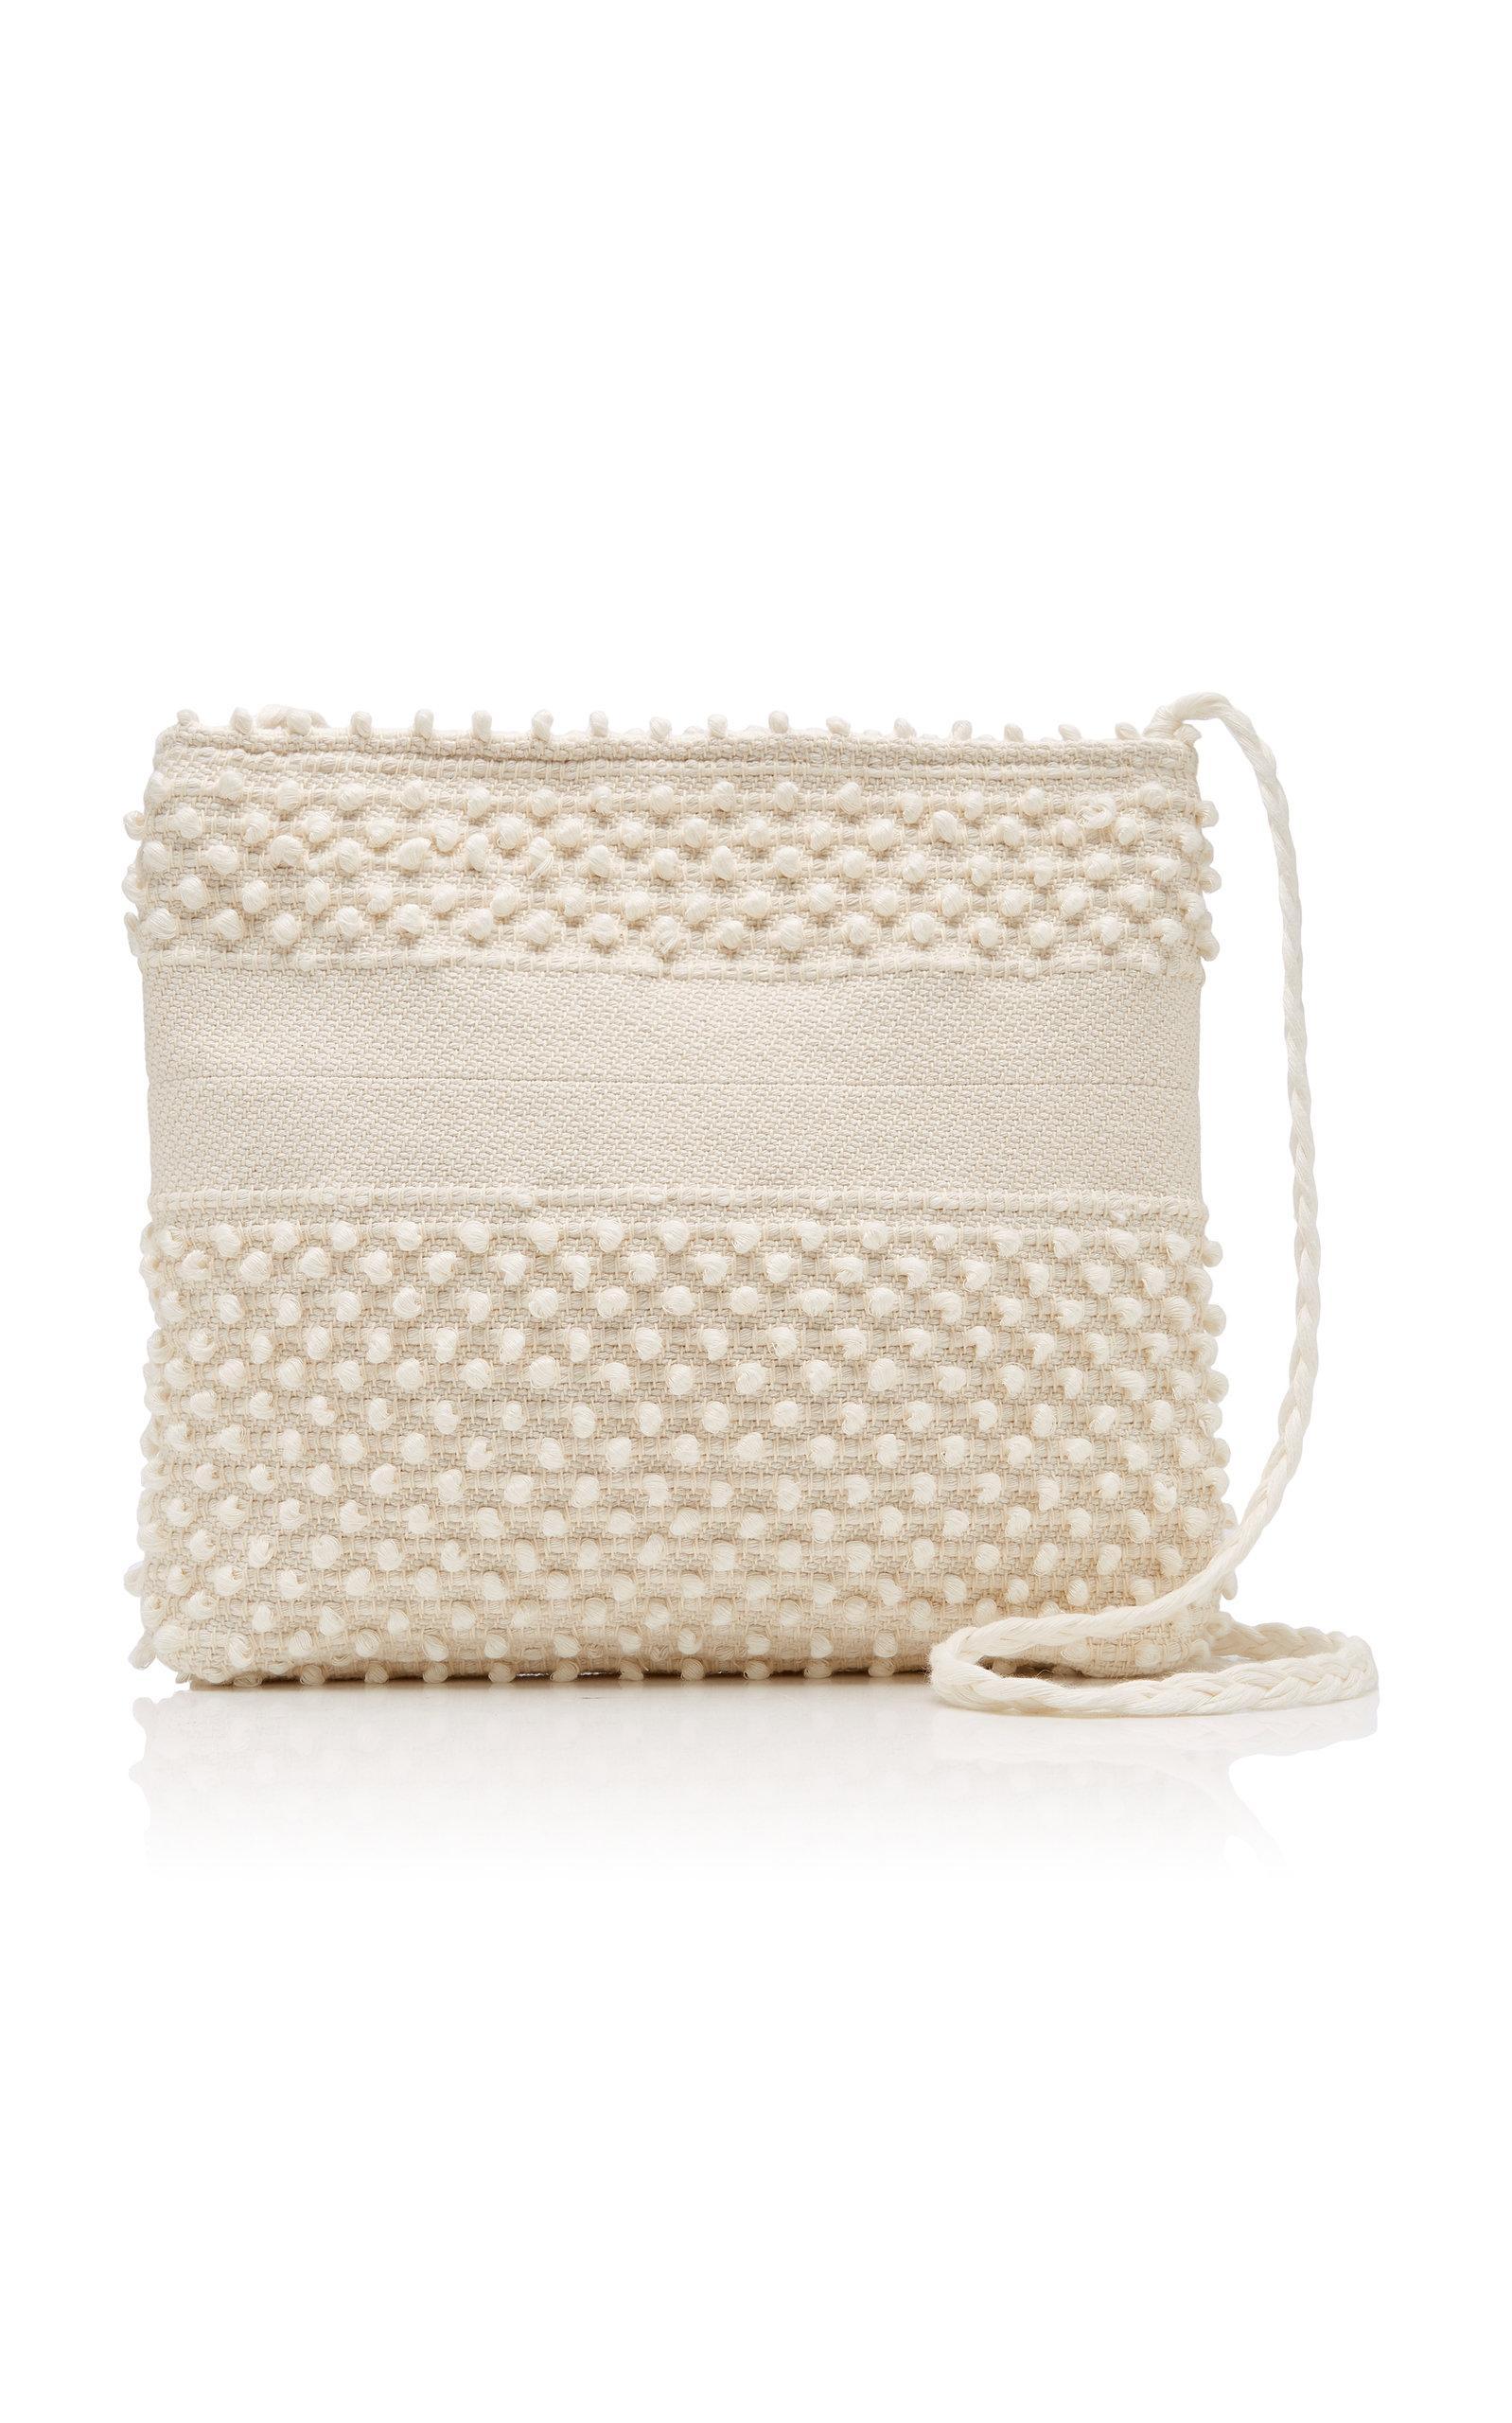 36d9f622e7efc Antonello Florina Textured Woven Shoulder Bag in White - Lyst